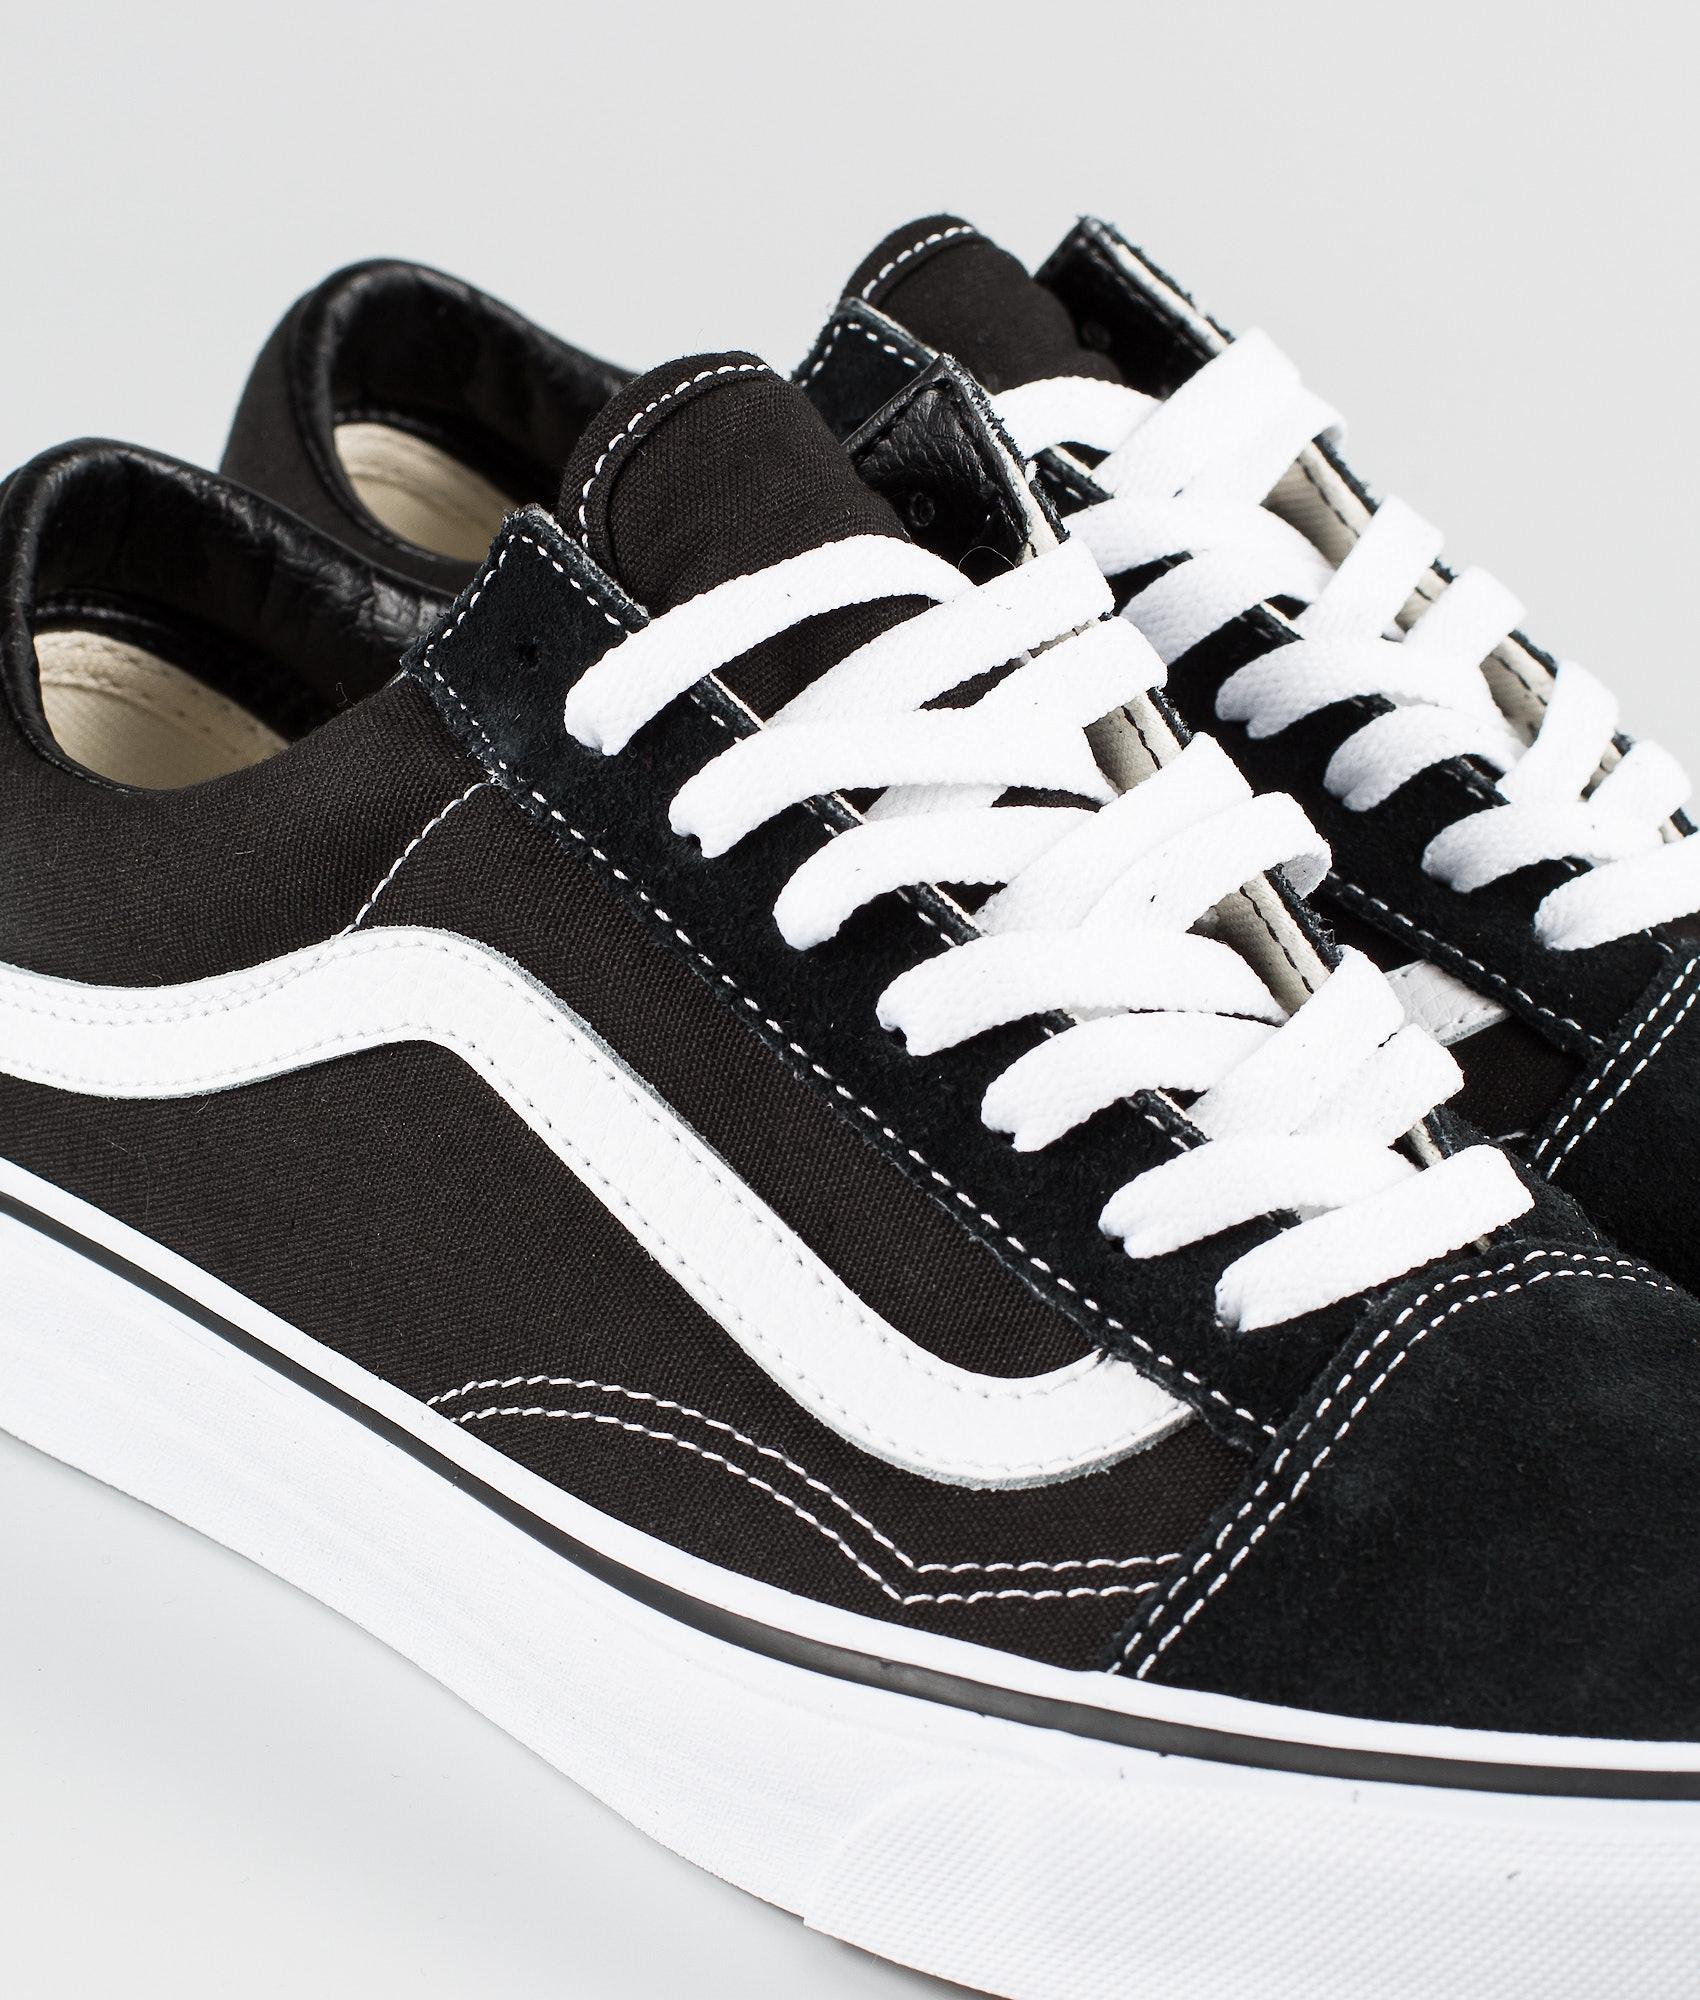 f4a6fe9b6a433b Vans Old Skool Shoes Black White - Ridestore.com